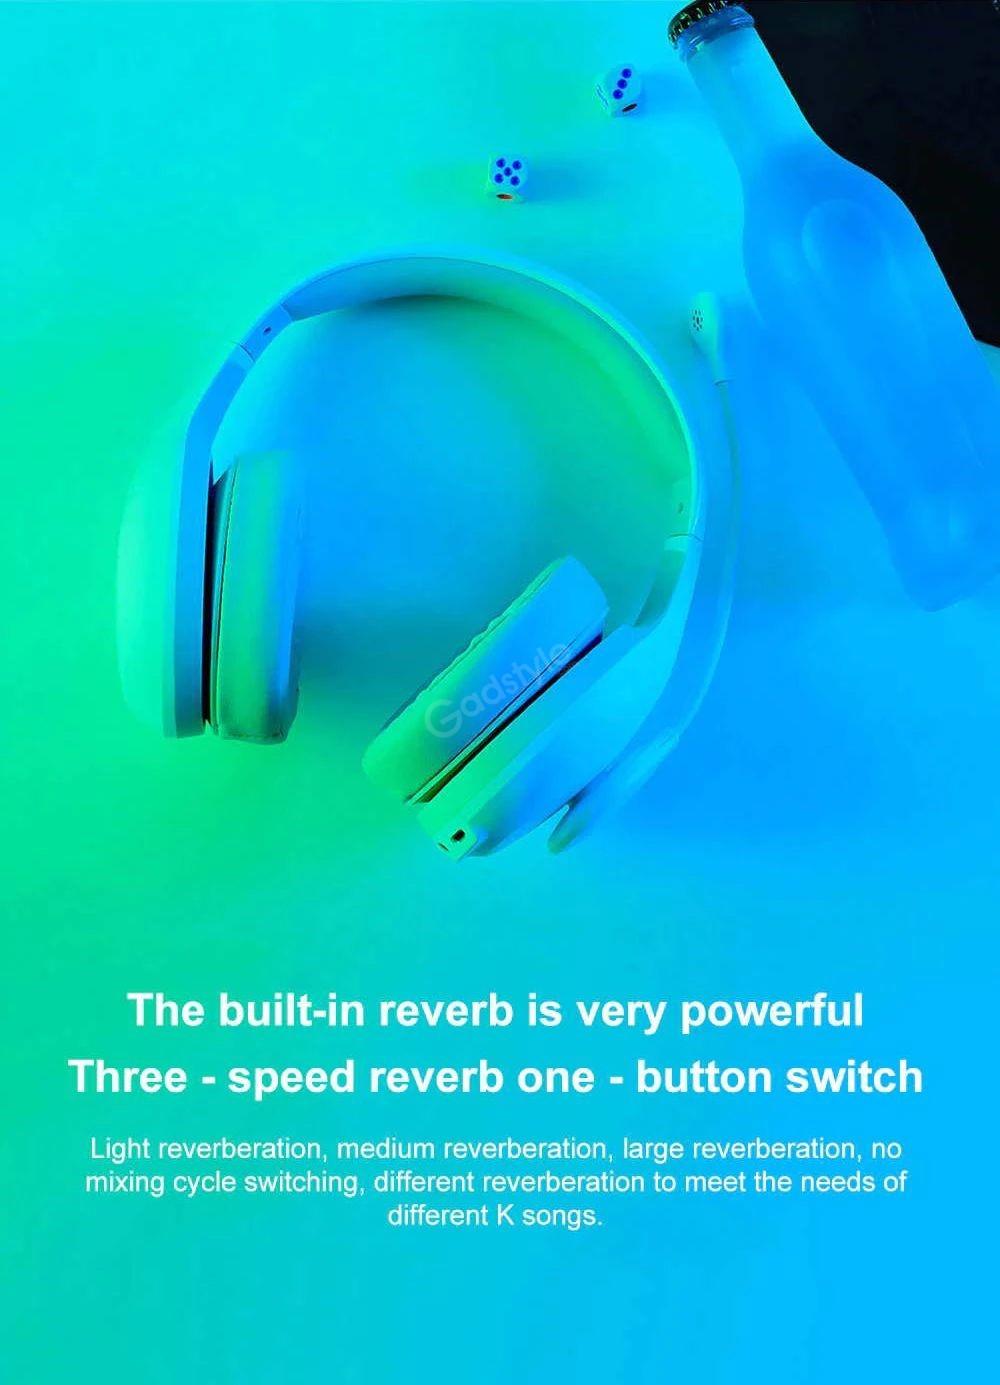 Xiaomi Ndz 18 Ai 40mm Speaker Wired Headphone With Microphone (5)